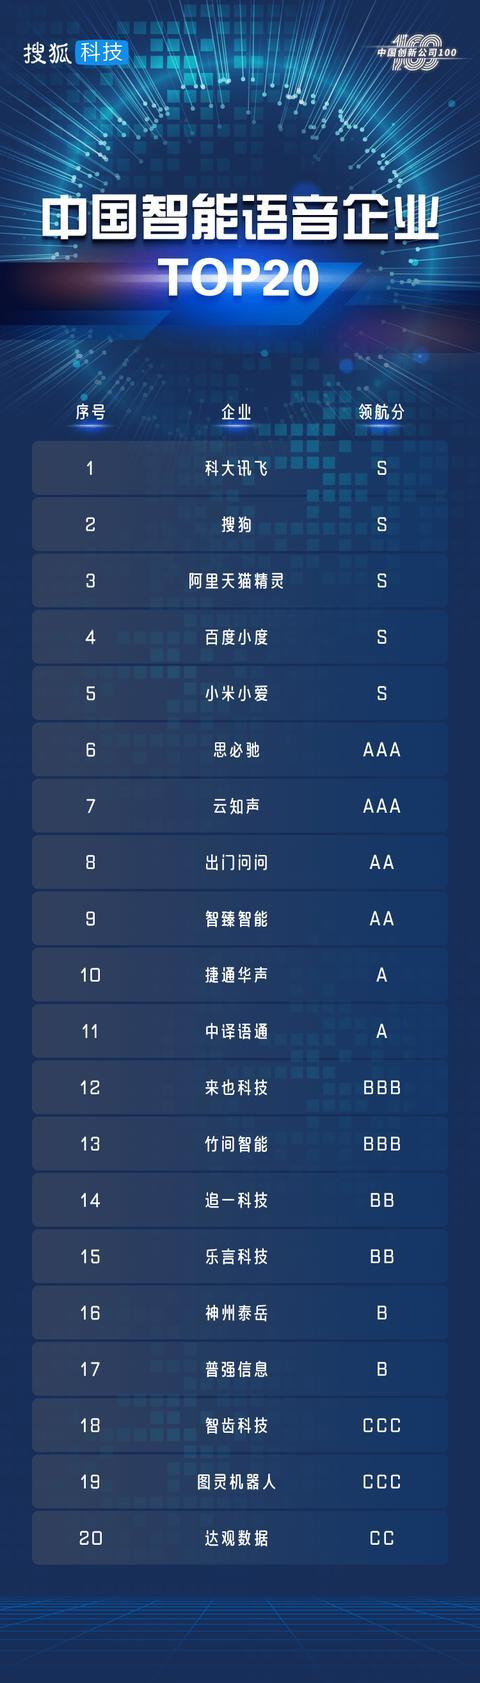 ai智能语音平台(ai语音助手排名)